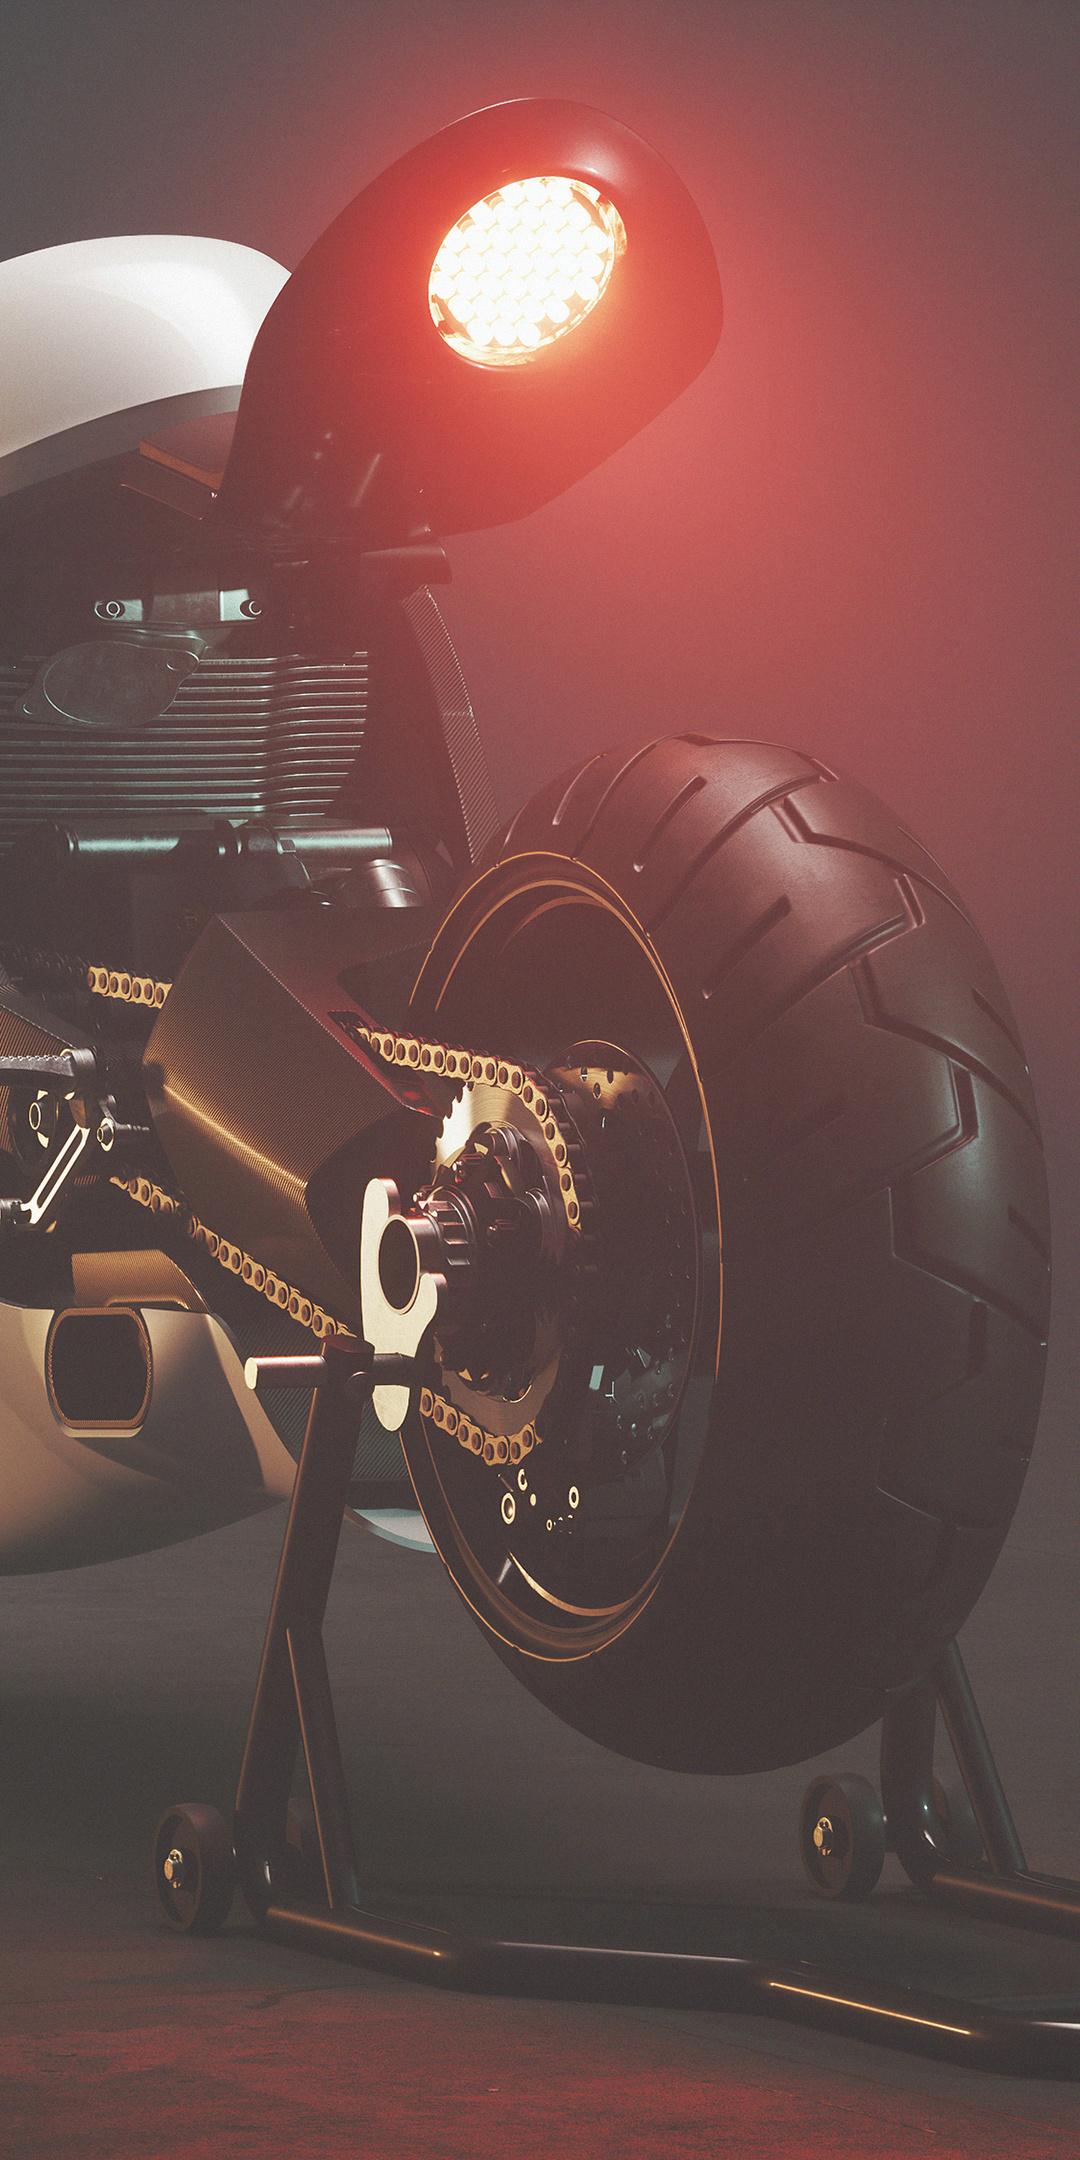 moto-racer-f-strom-cgi-4k-xb.jpg